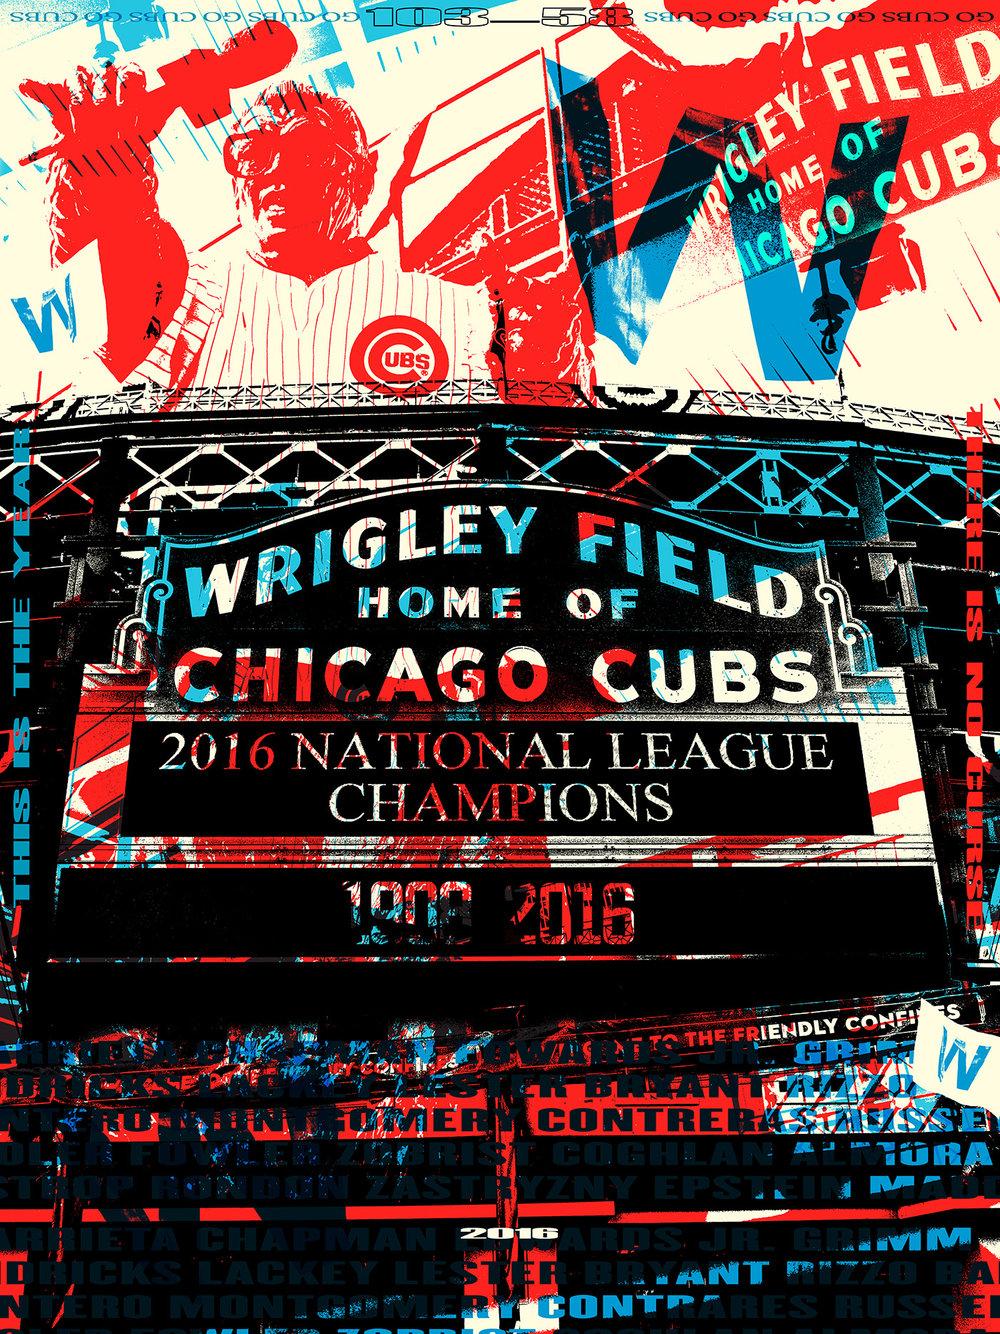 ESPN.COM - Chicago Cubs NLCS Tribute